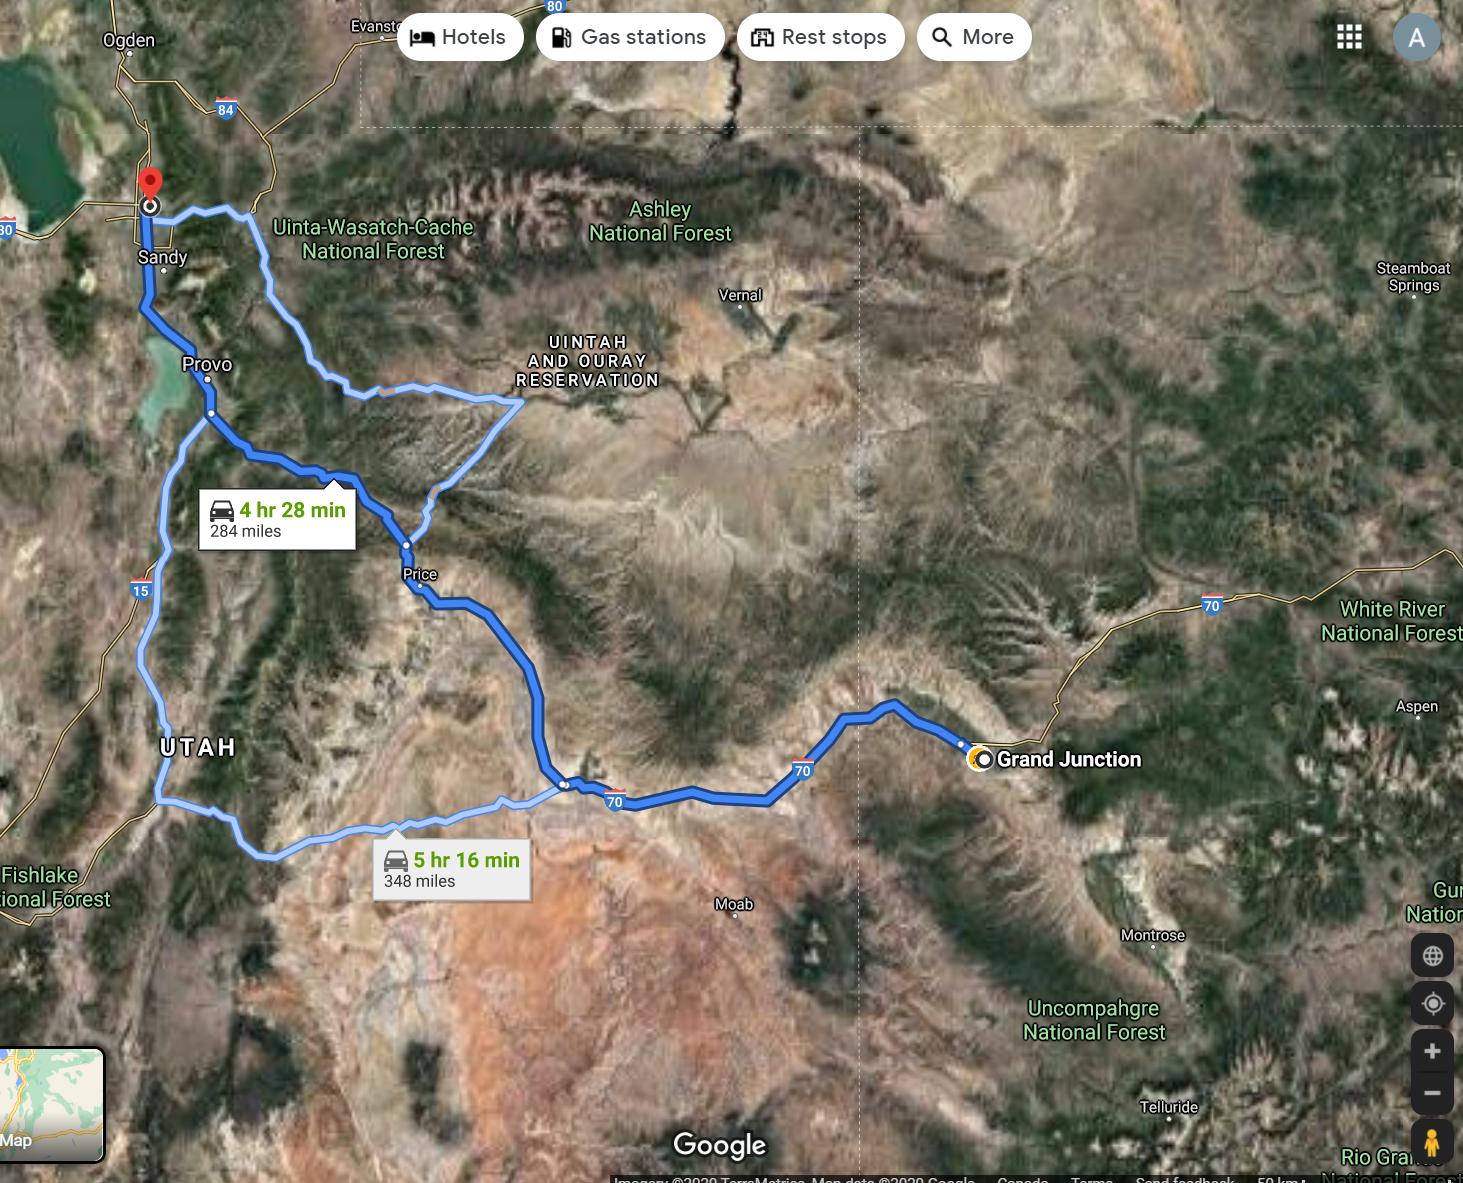 2020_12_01_17_19_27_grand_junction_colorado_usa_to_salt_lake_city_ut_usa_google_maps_bd0cbb2f9dd1cb310b19ddb30afb5c6e643a2c0e.png